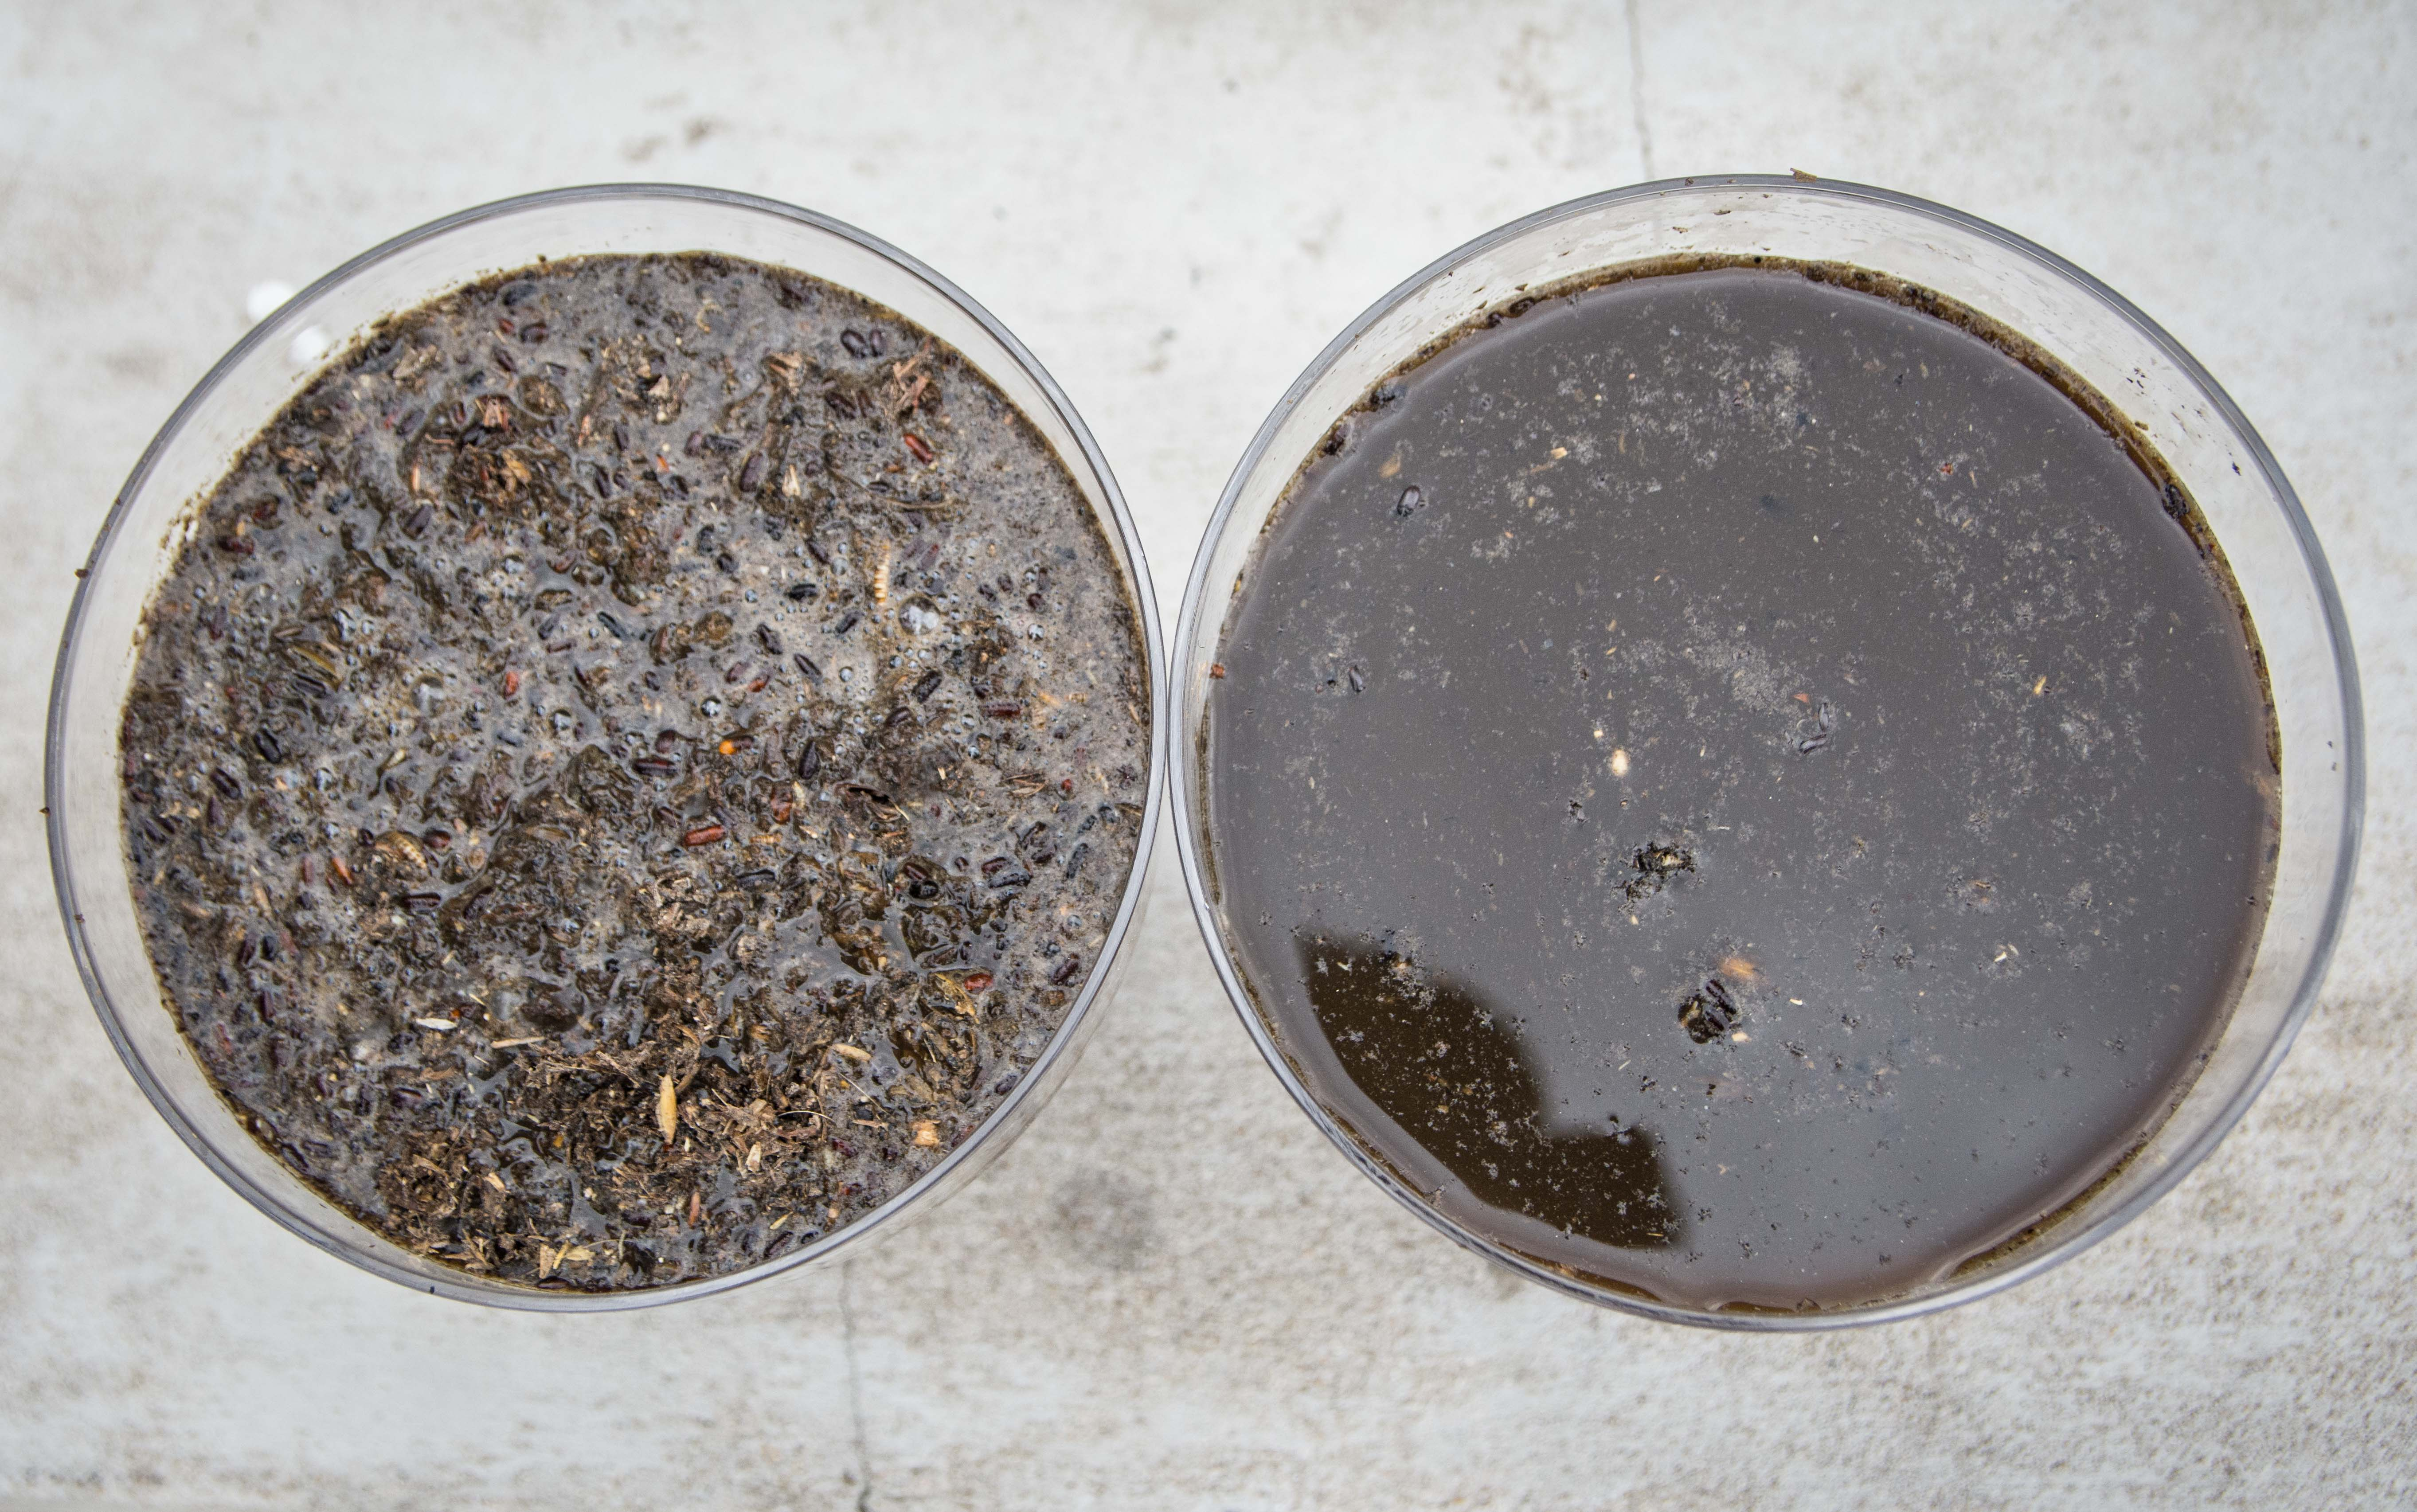 kożuch na gnojowicy